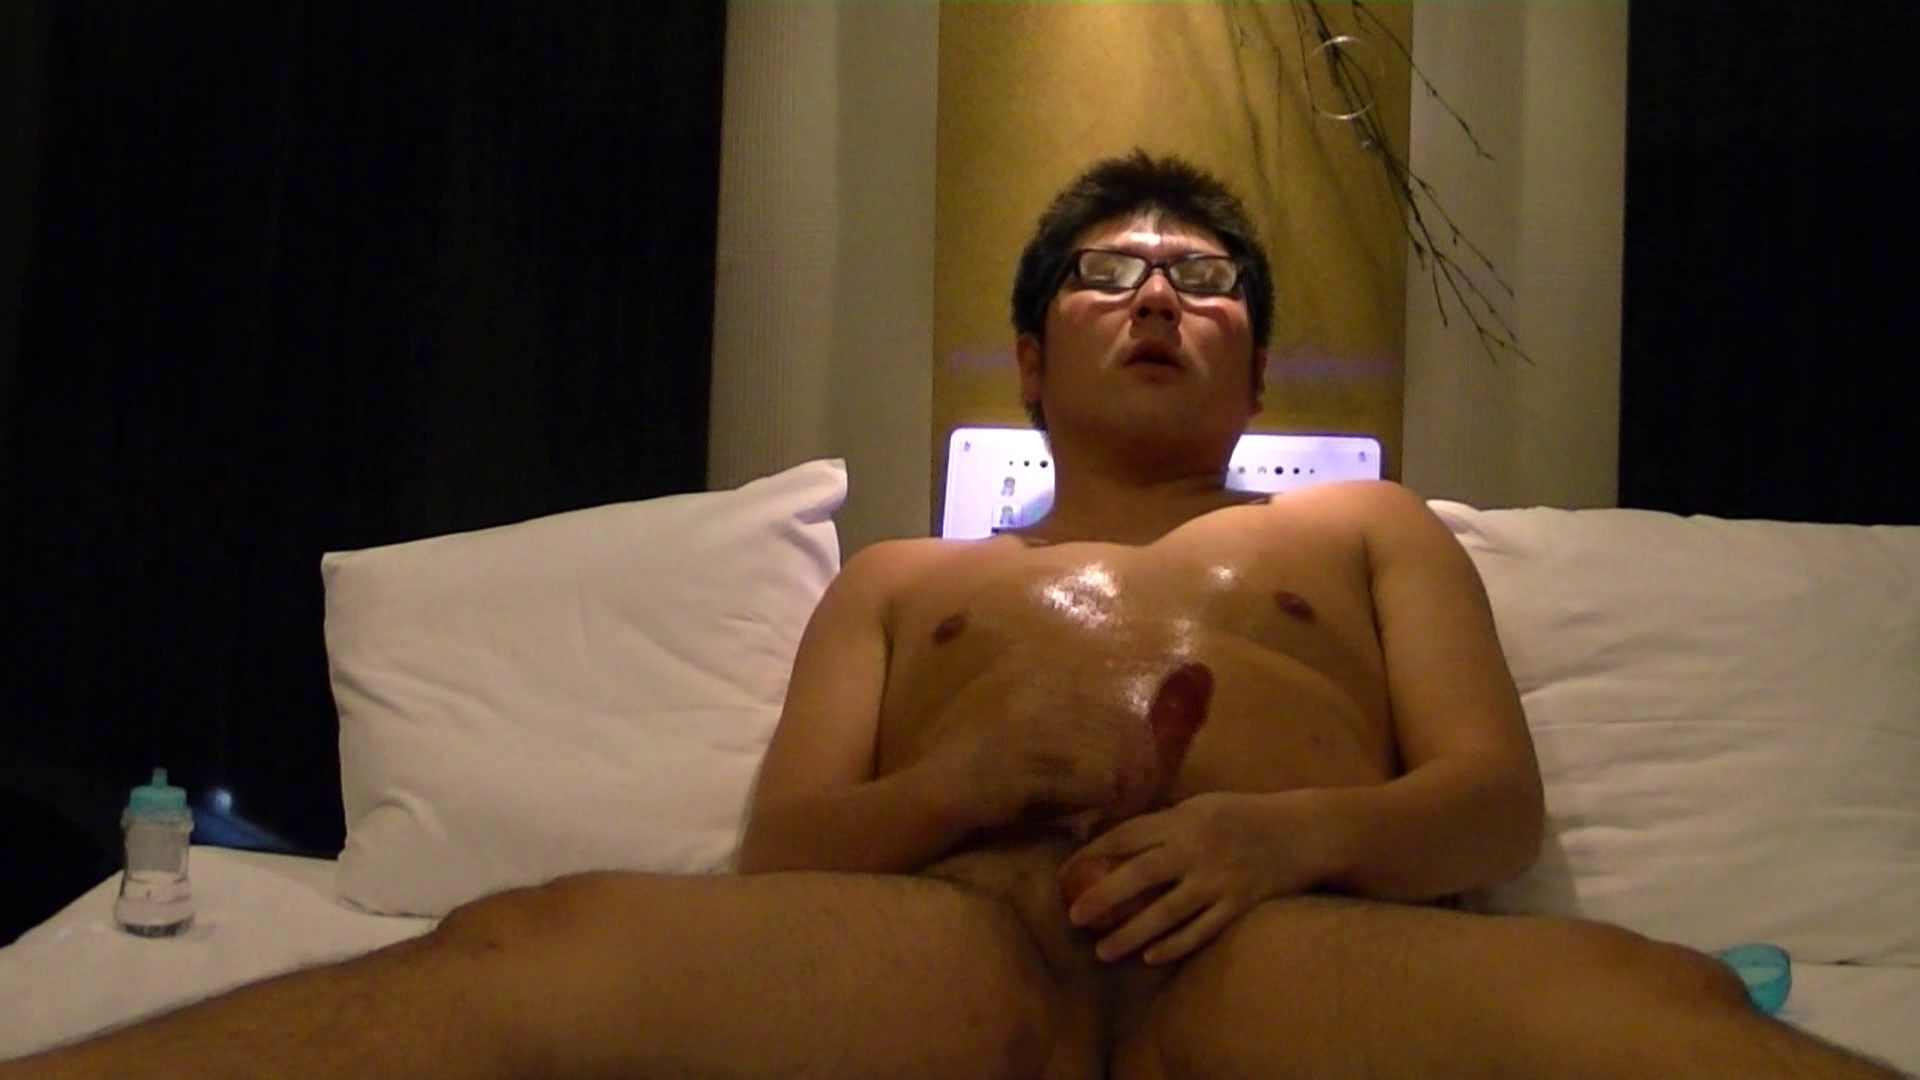 Mr.オナックスさん投稿!HD 貴方のオナニー三万円で撮影させてください。VOL.03 後編 オナニー編 ゲイAV画像 106枚 32